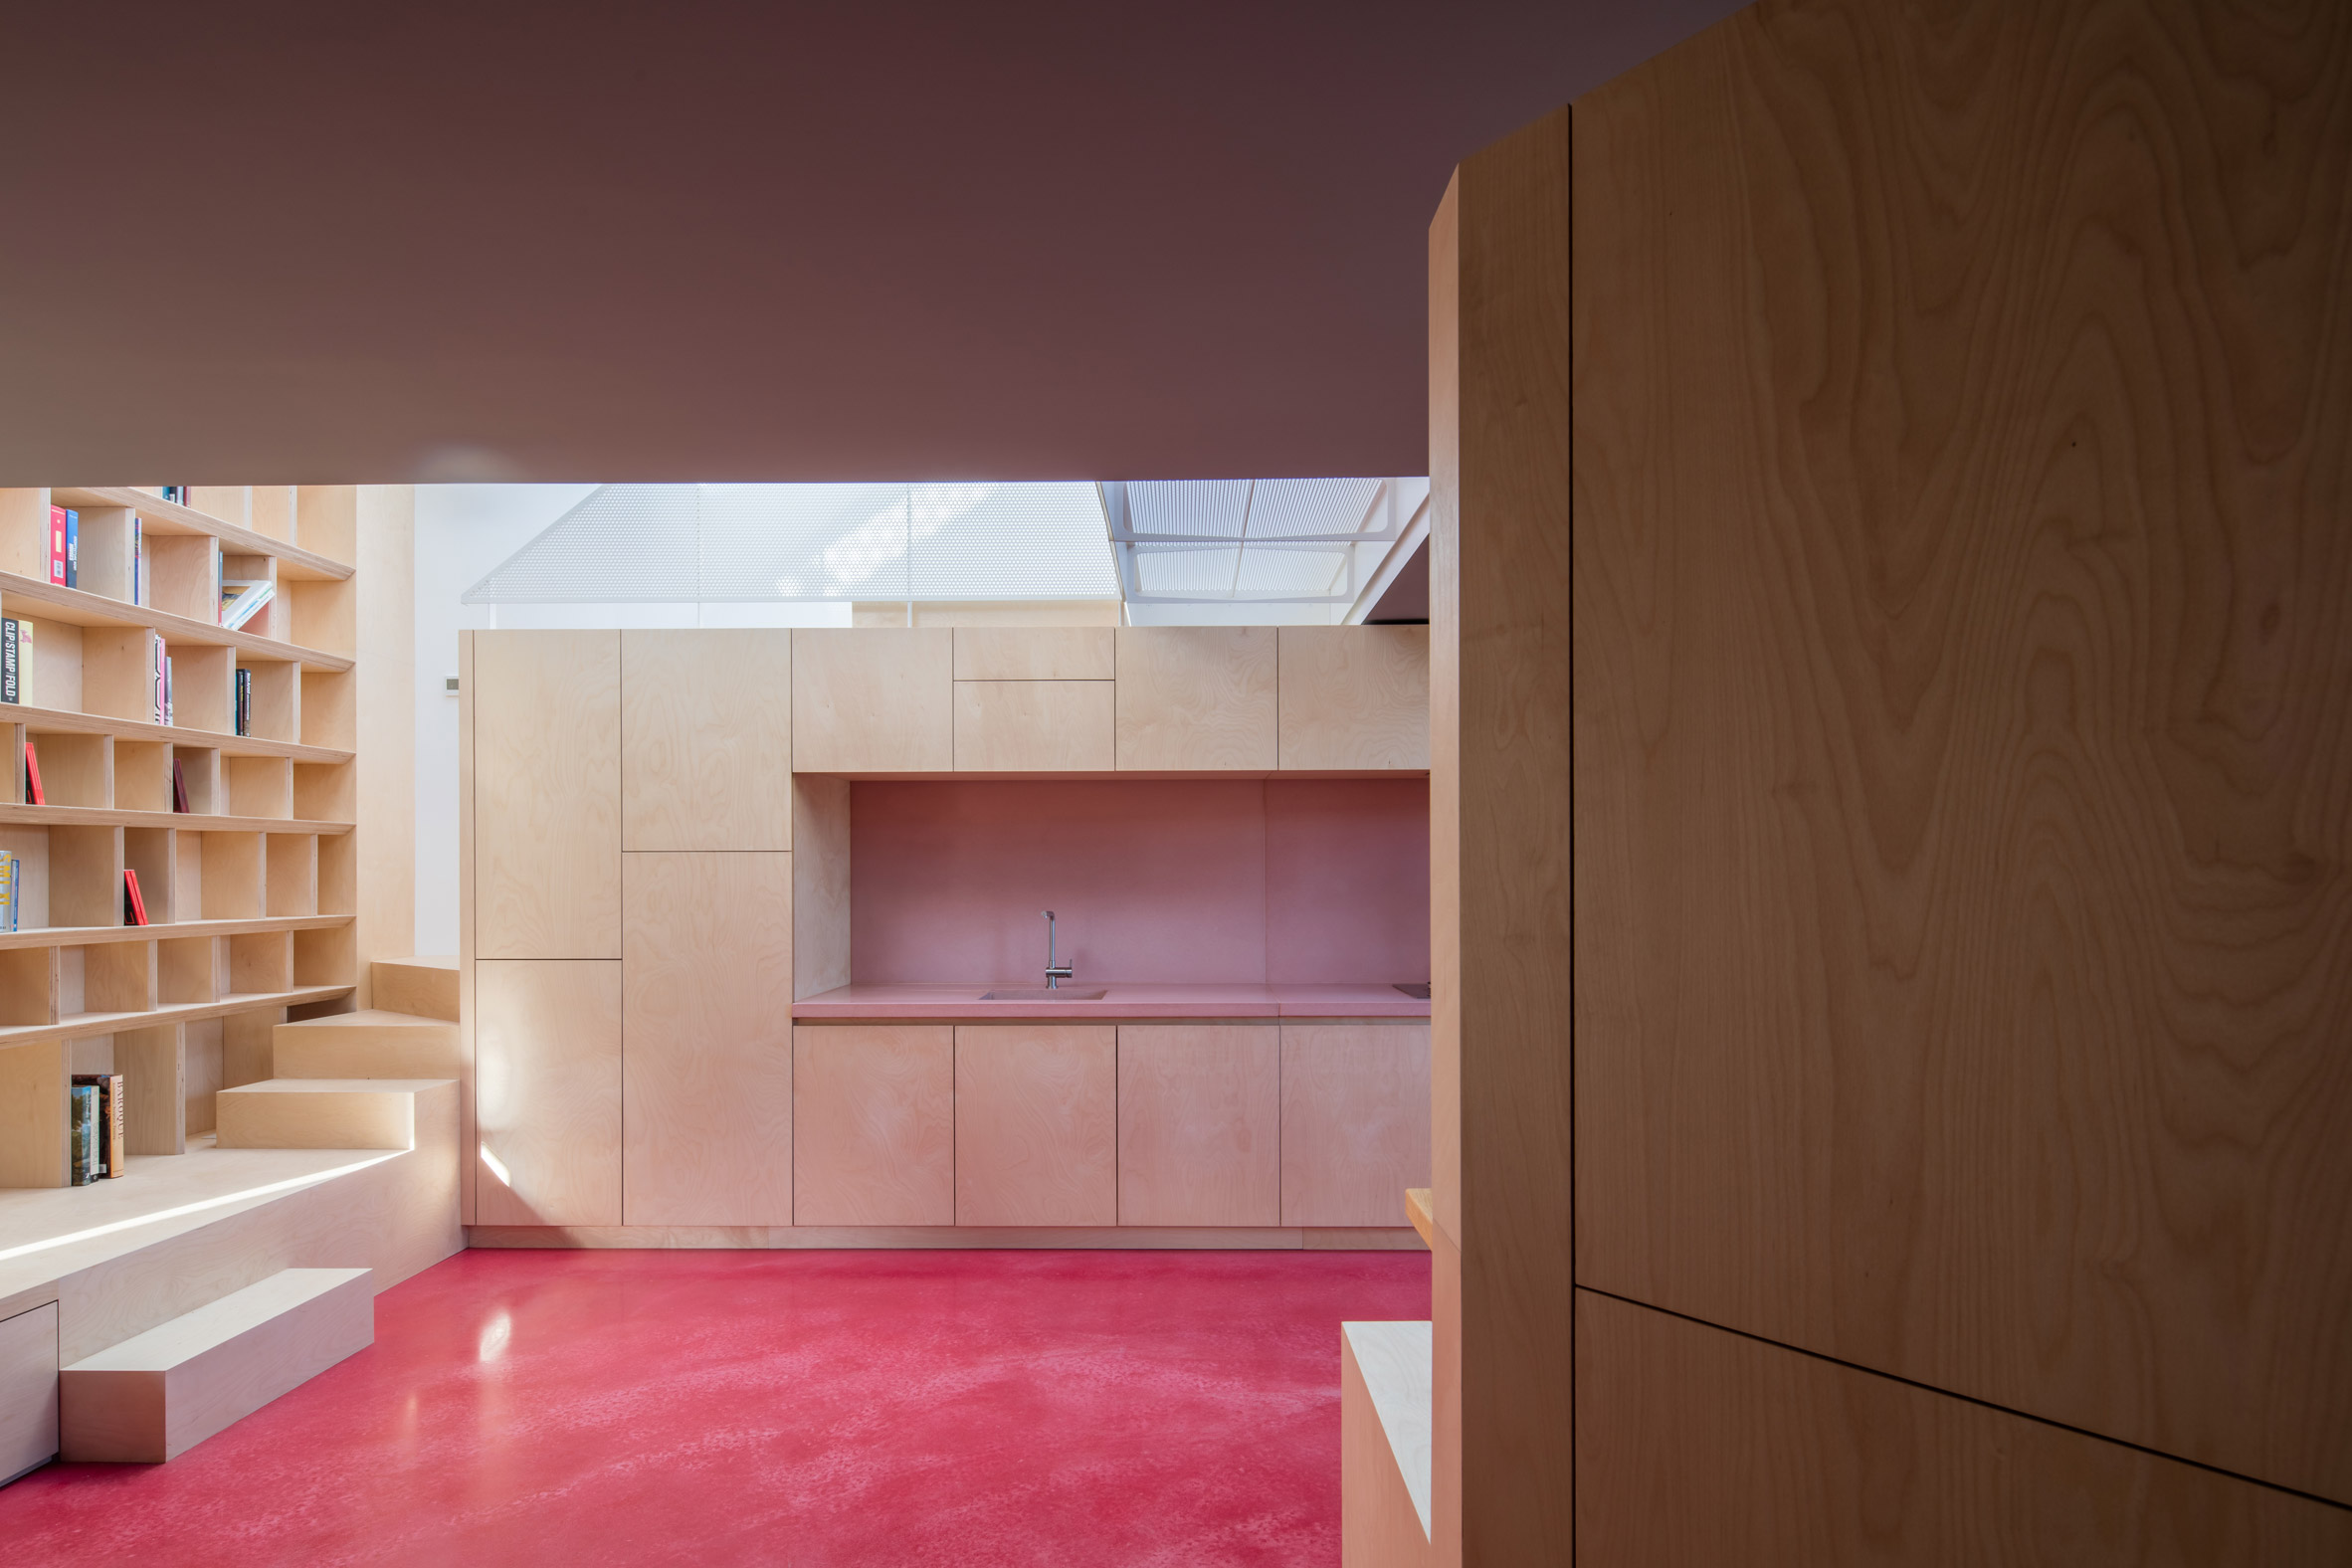 Noiascape's west London co-living space targets home-avoiding millennials